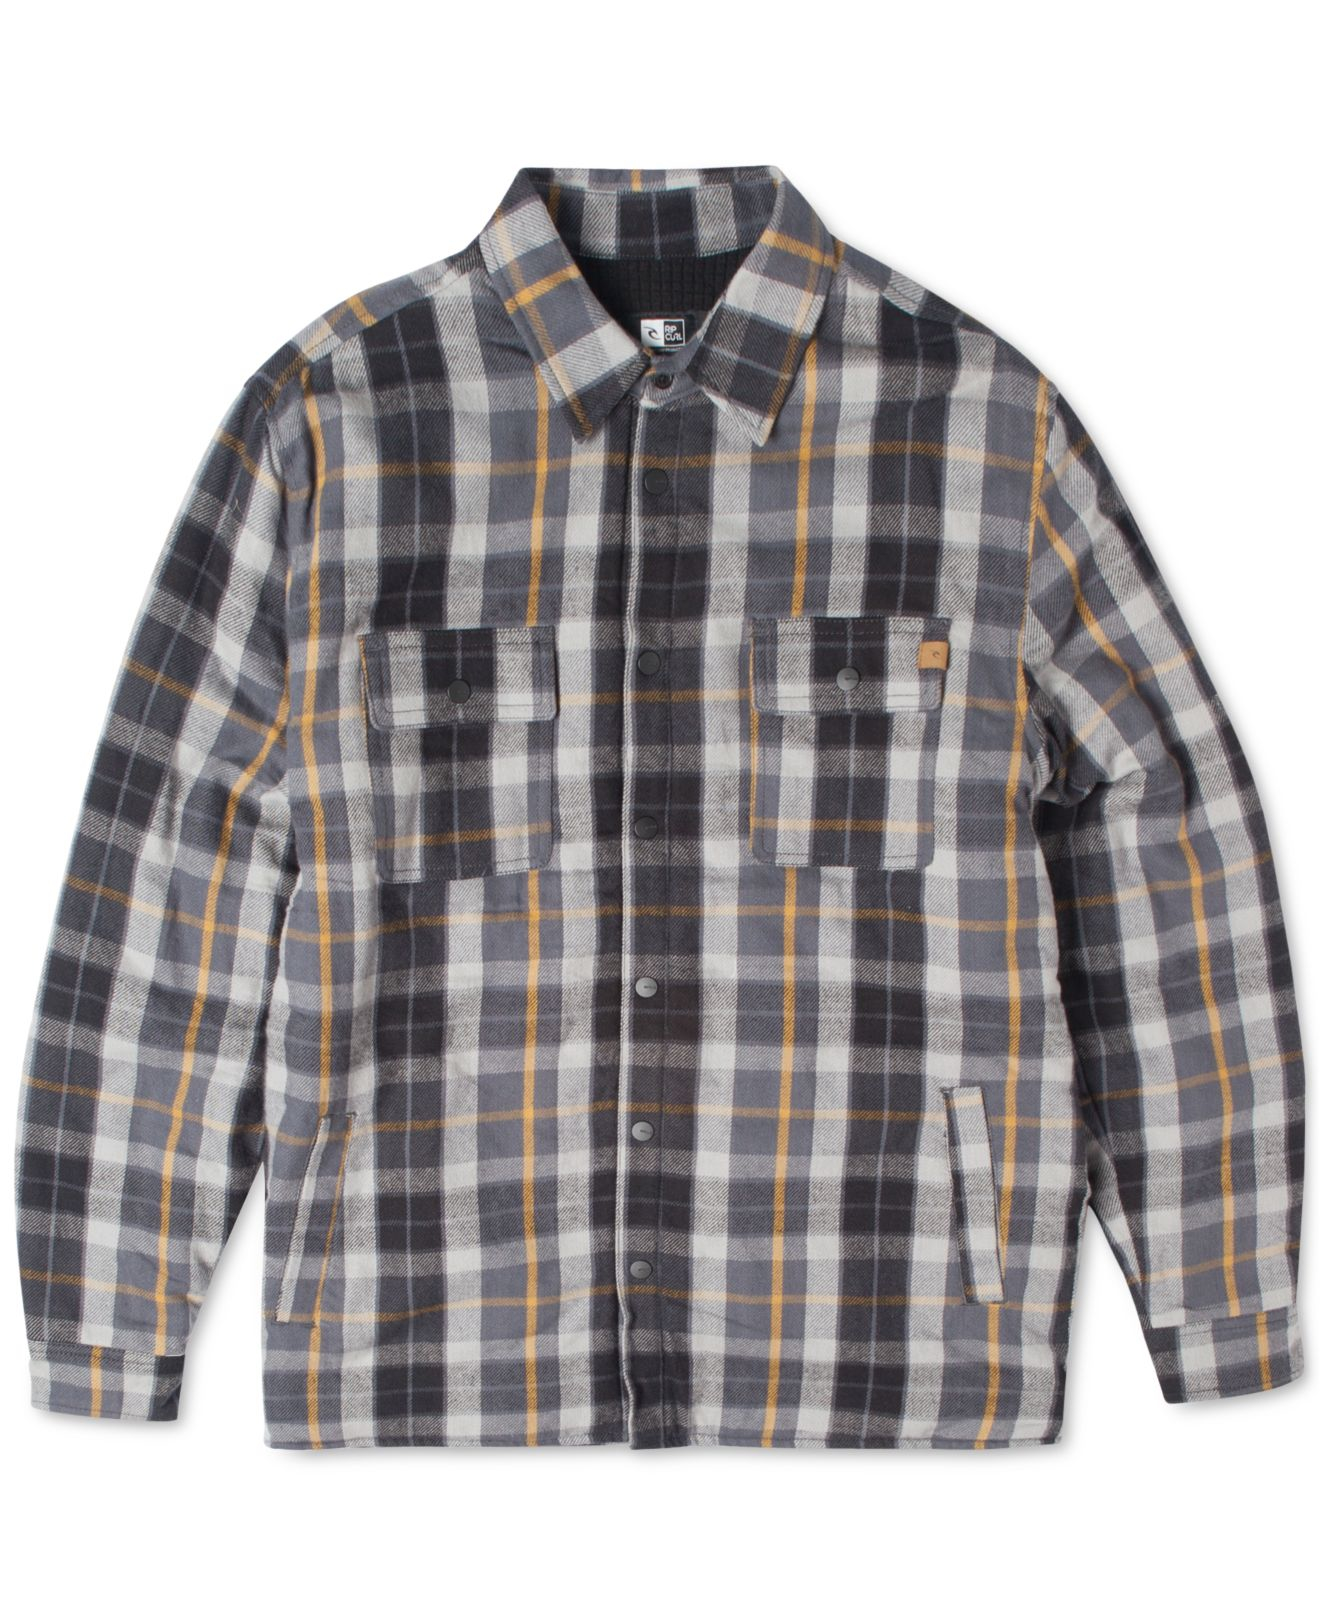 Lyst Rip Curl Gibbs Plaid Flannel Long Sleeve Shirt